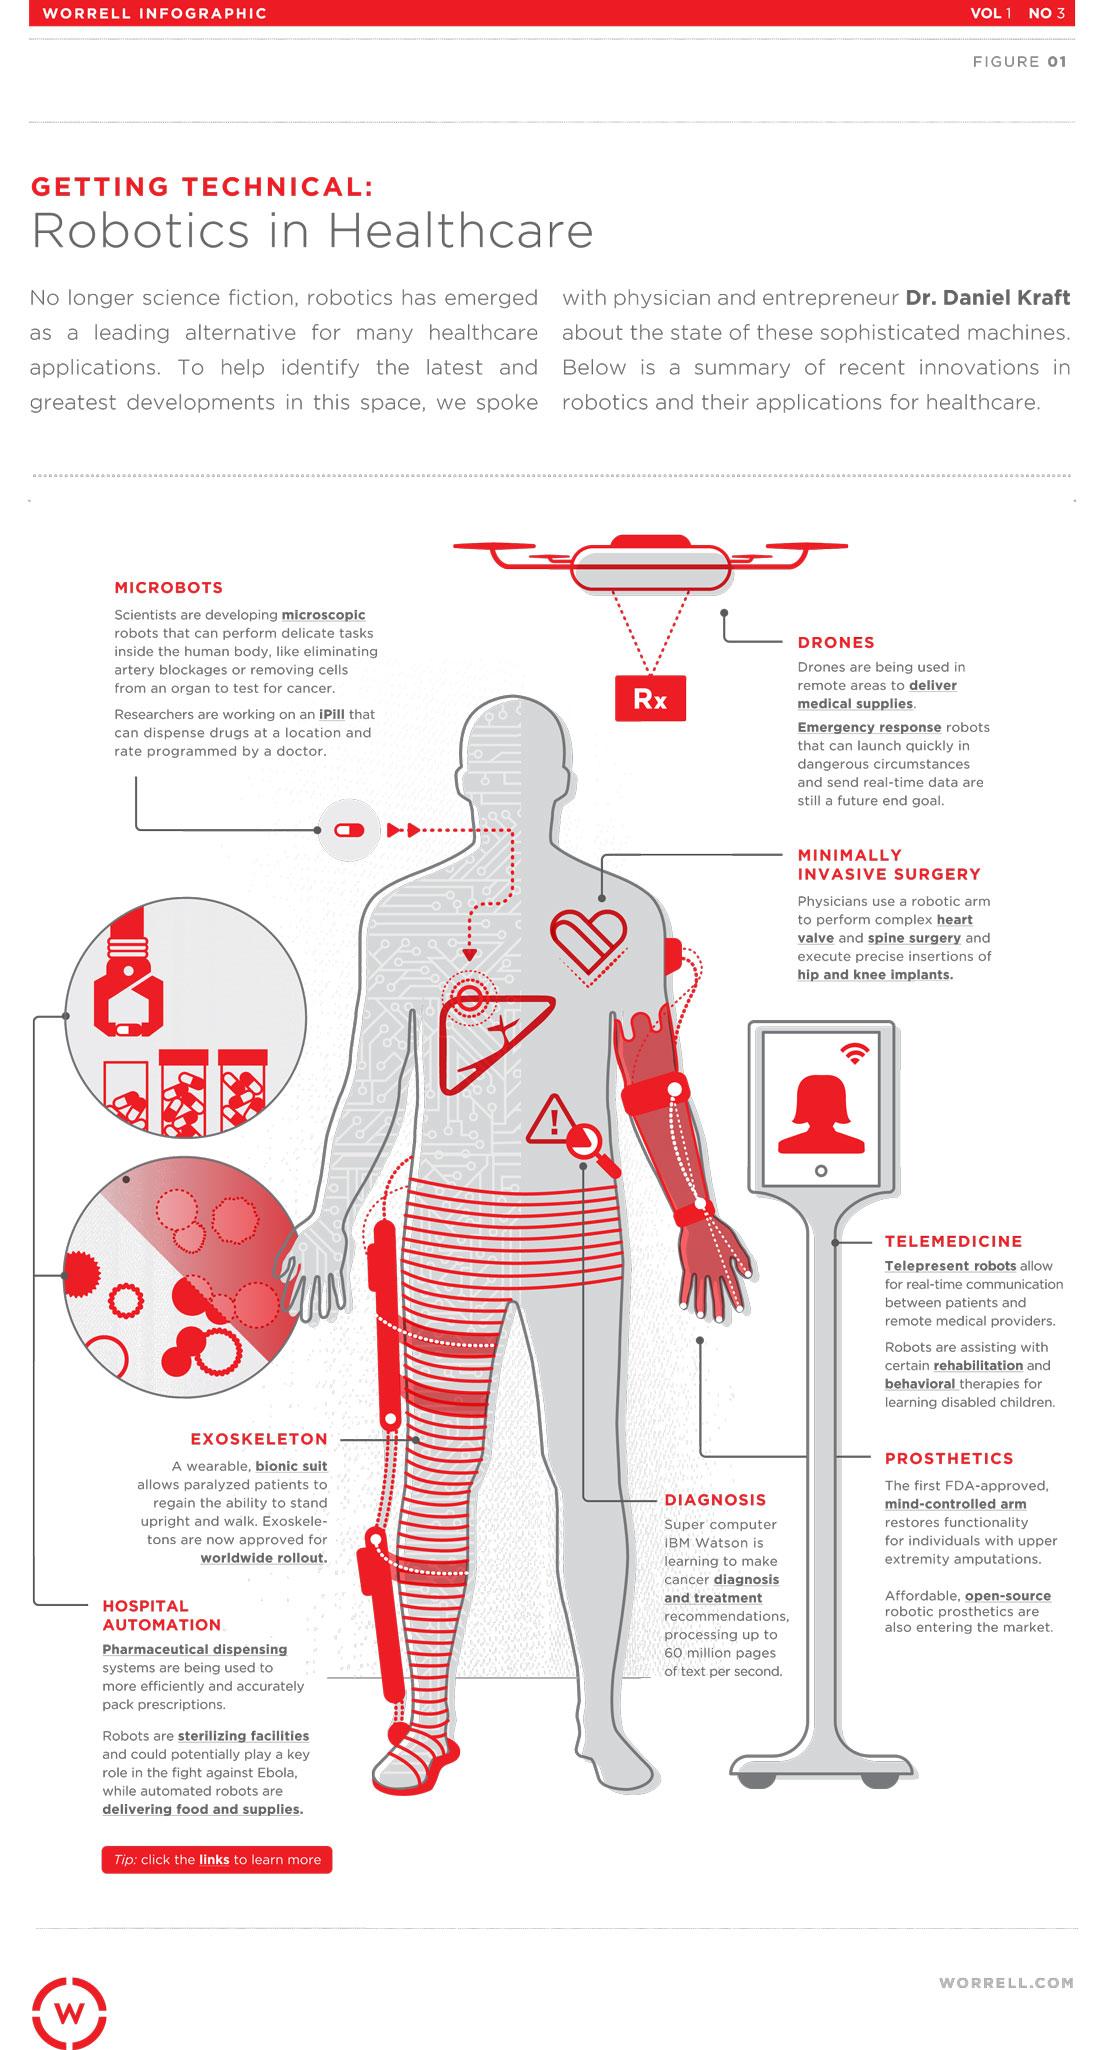 telemedicine vast potential and increased efficiency